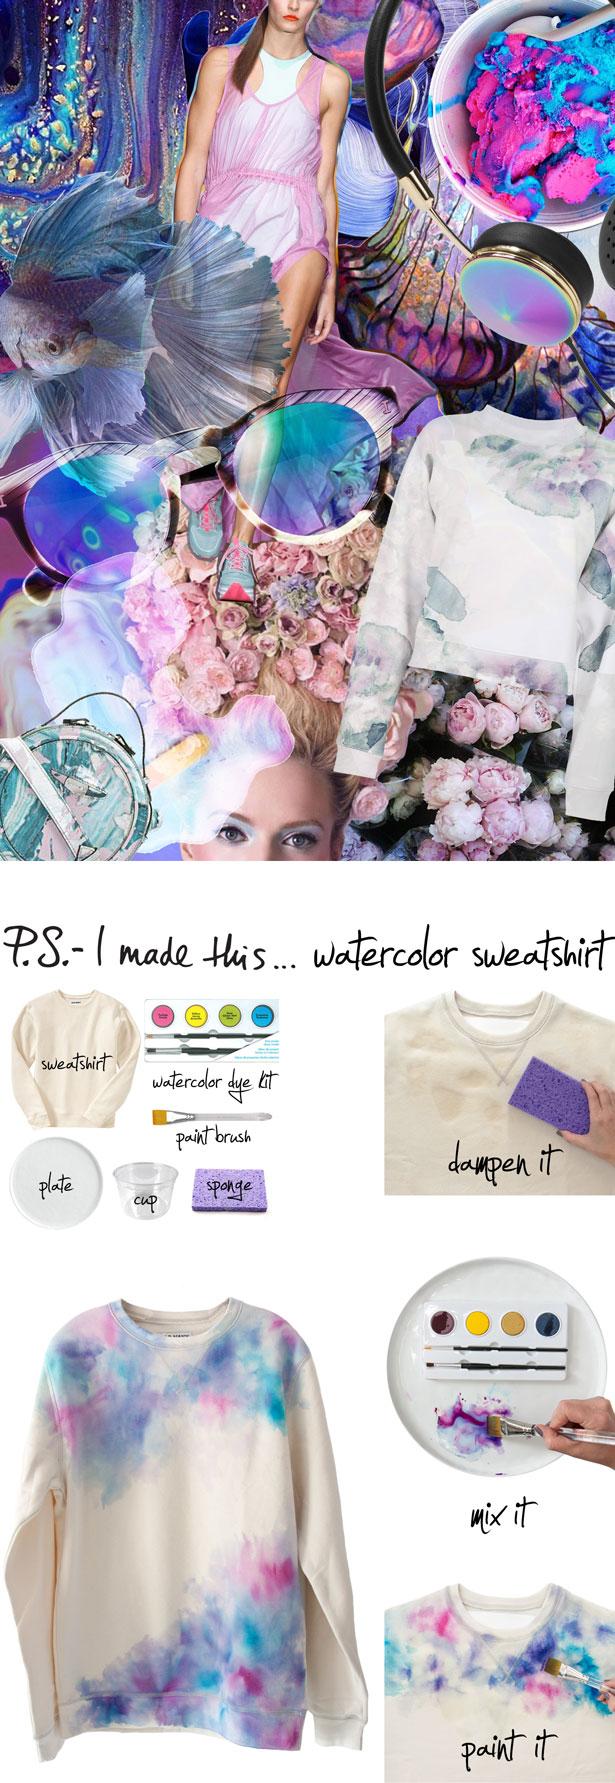 01.16.14_Warercolor-Sweatshirt-MERGED-small